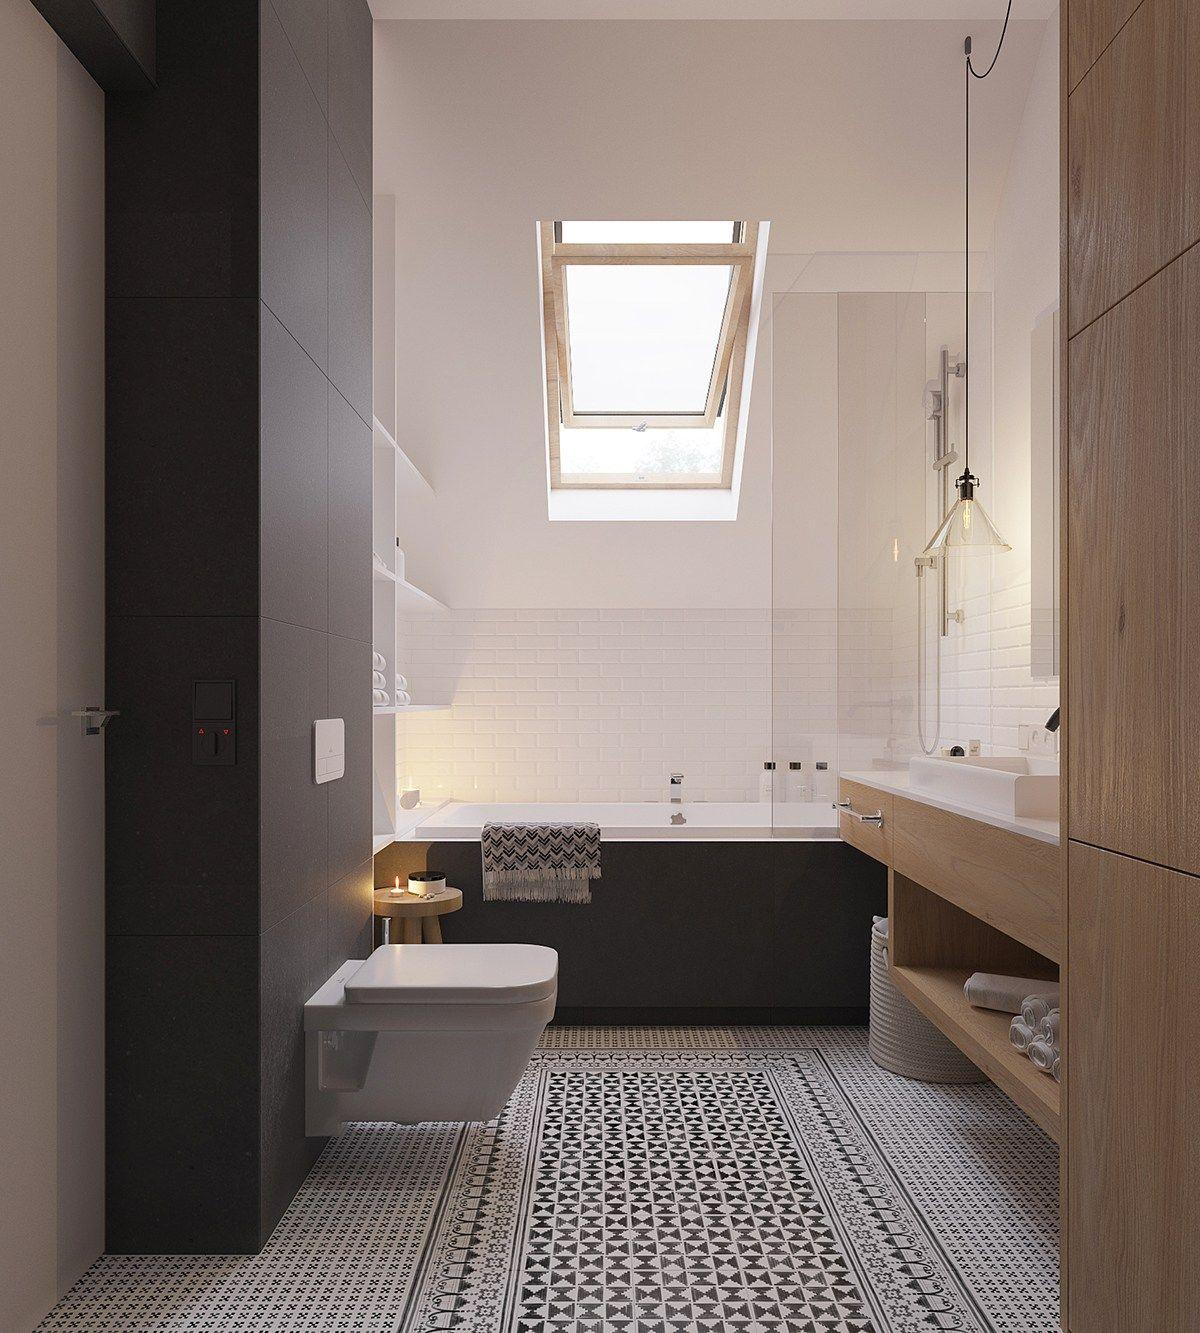 Elegantes badezimmerdesign originale appartamento stile scandinavo moderno design unico ed